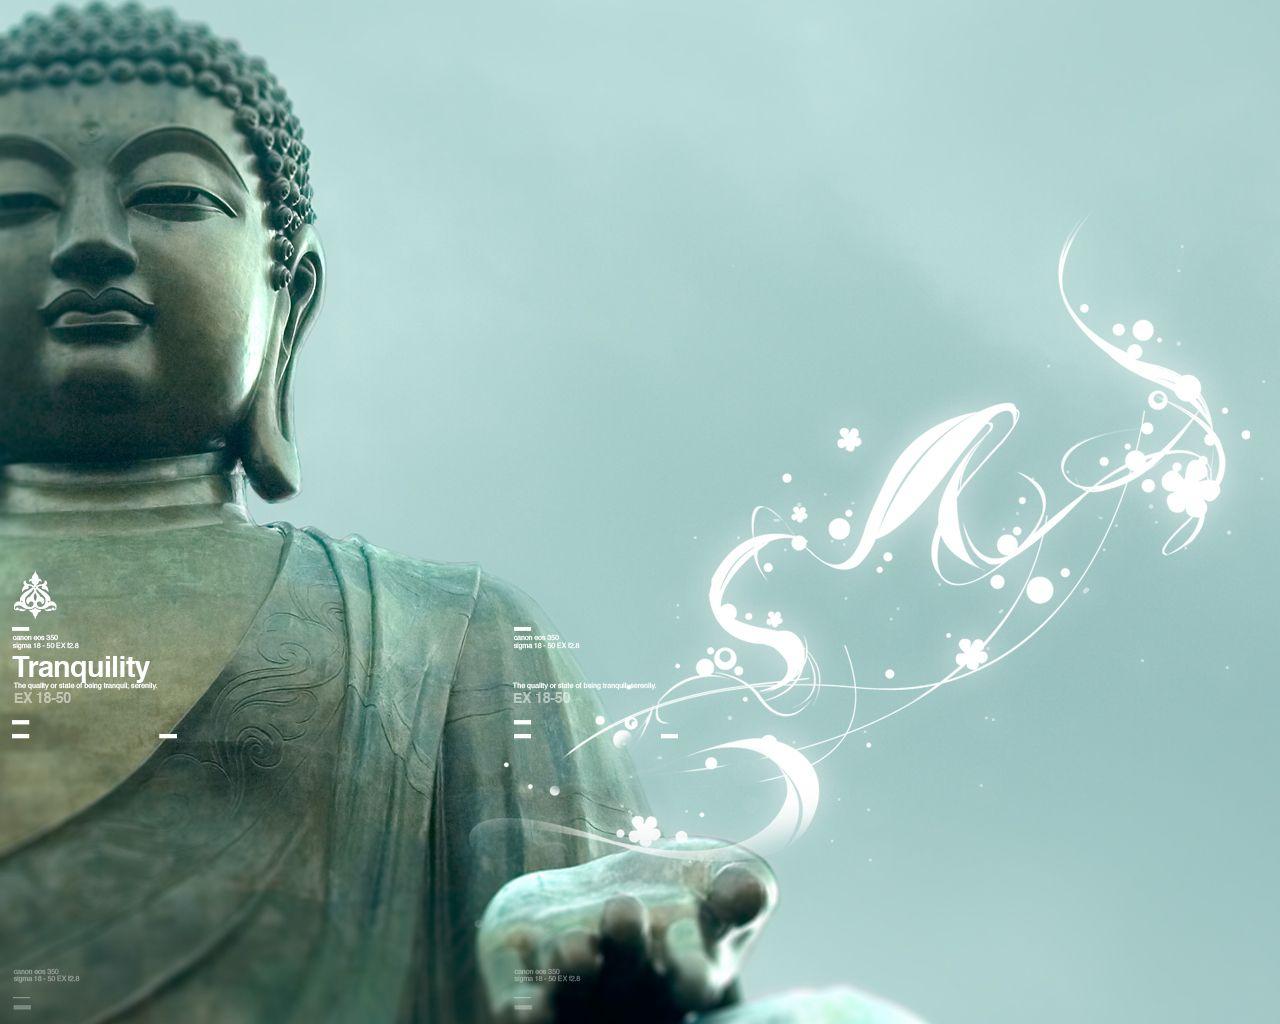 Buddha Download Desktop Wallpaper Hd Jpg 1 280 1 024 Pixels Buddha Zen Buddhist Meditation Buddha